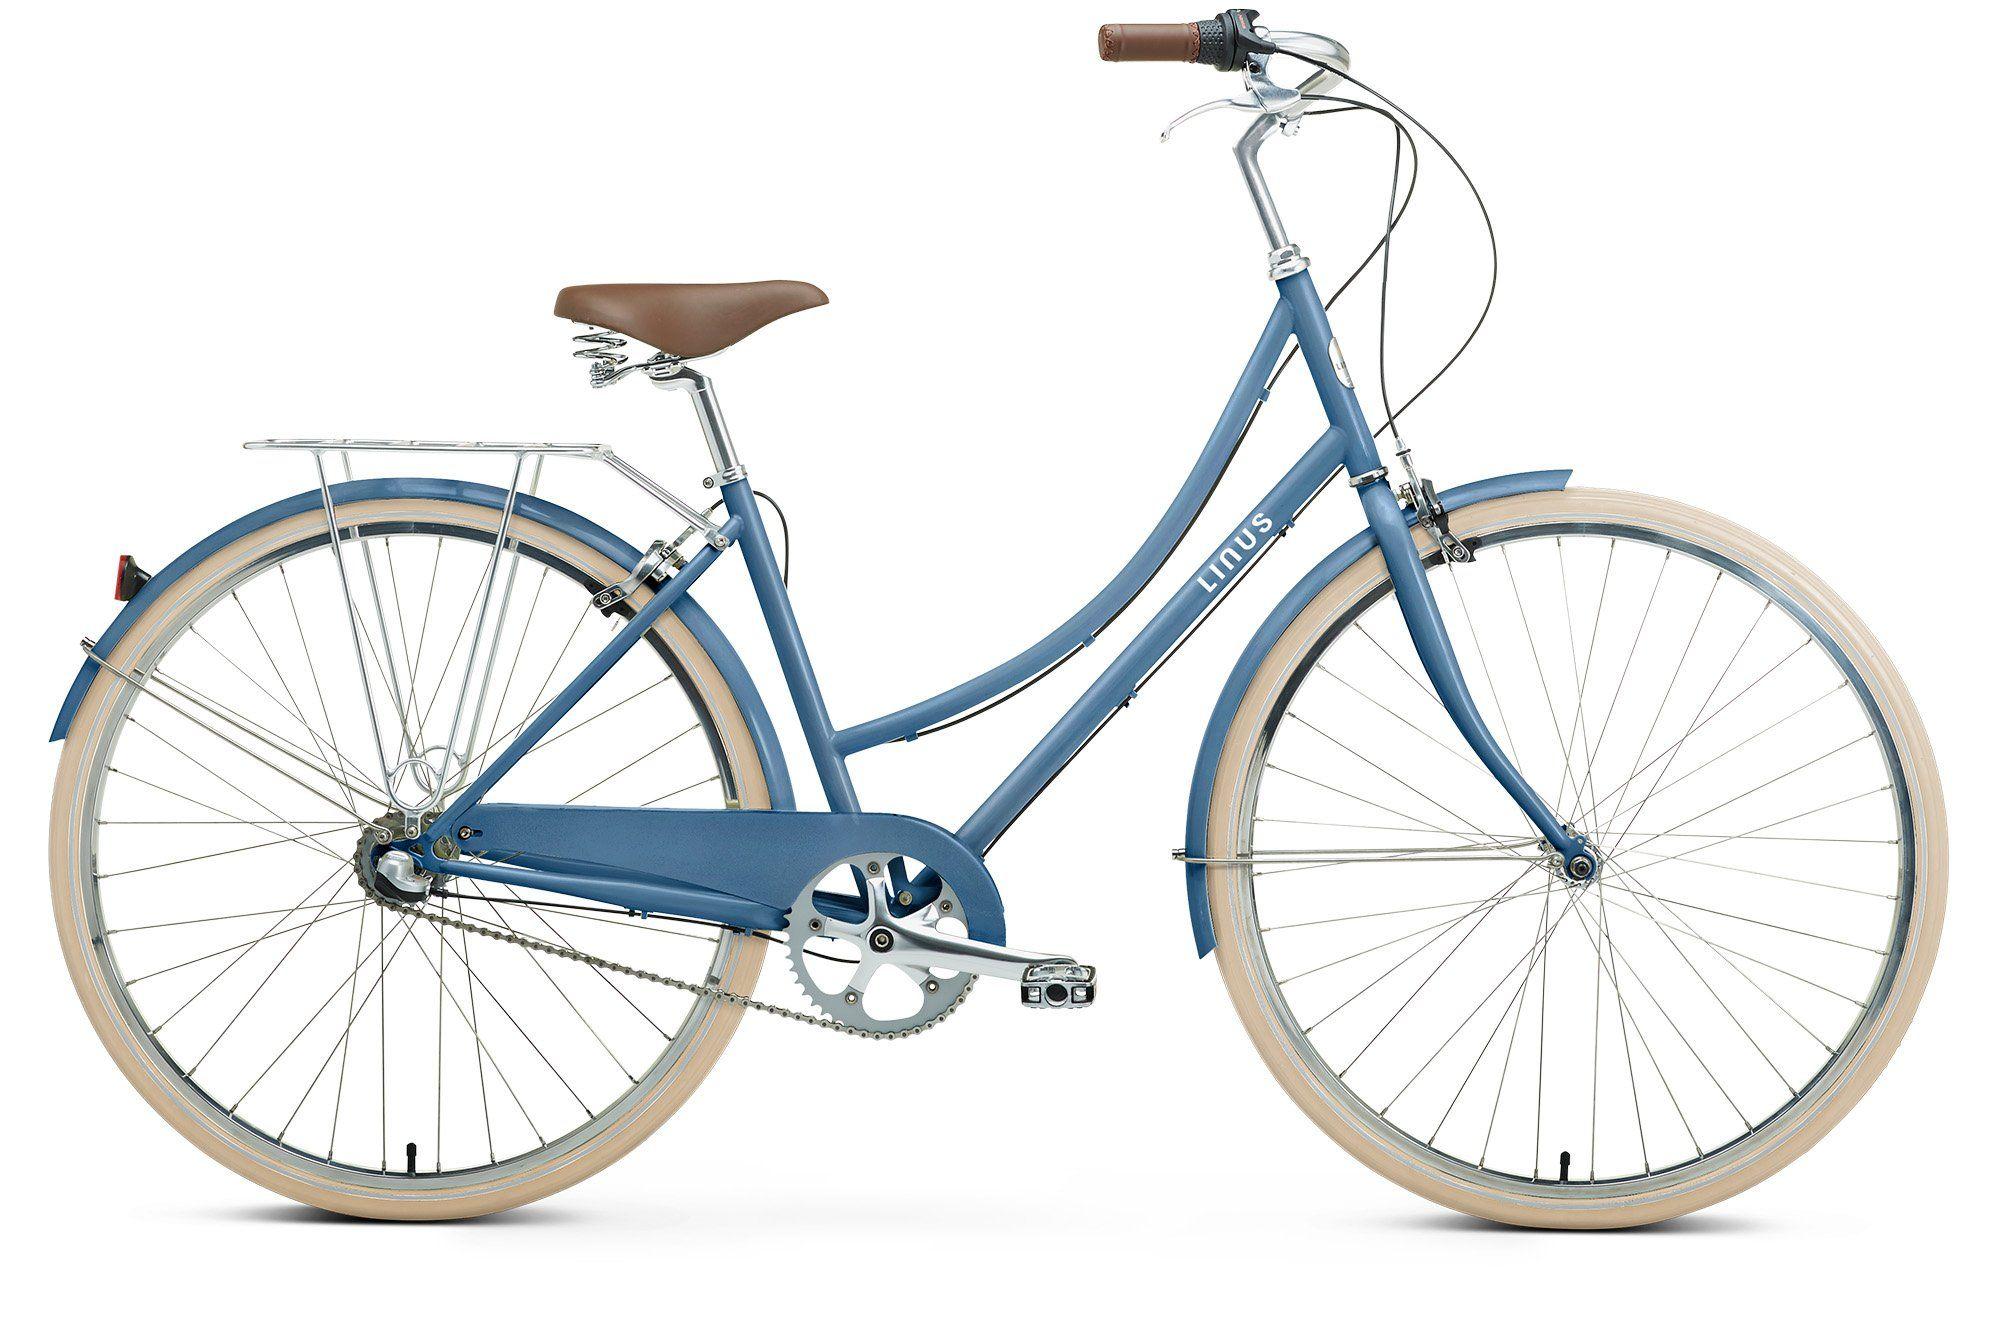 Sunlite Bicycle Ding Dong Steel Bell BLACK Cruiser Commuter Kids Bike